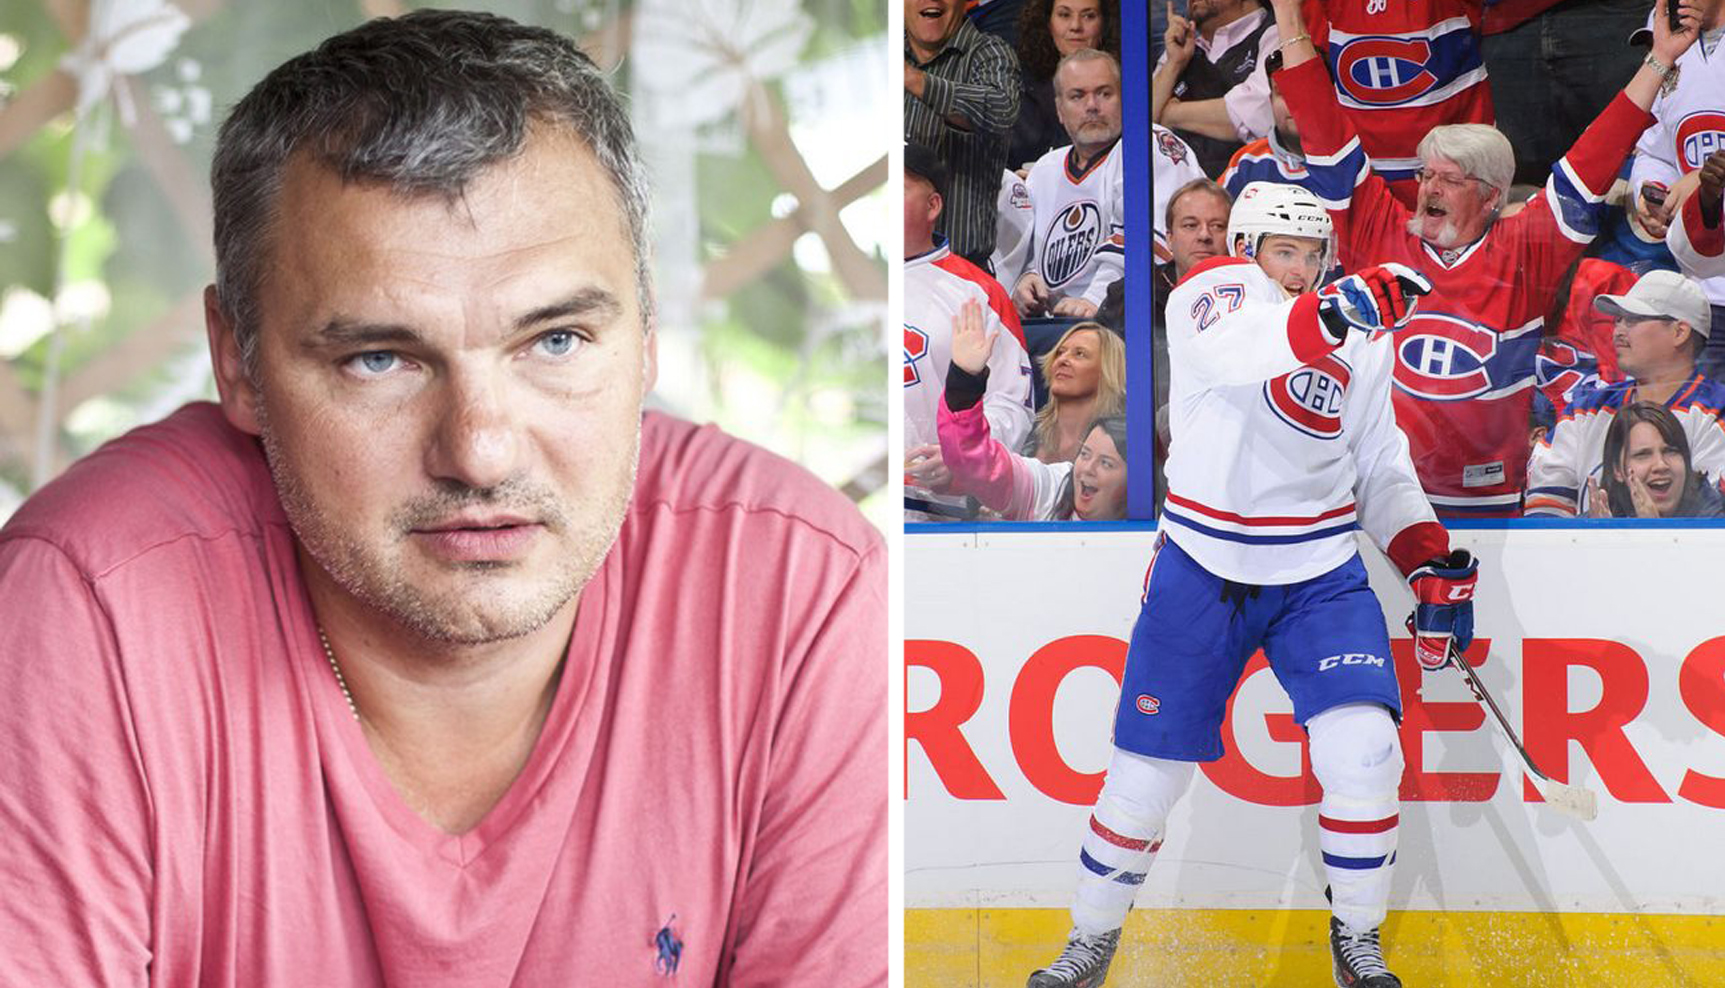 Фото: tribuna.com, belarushockey.com